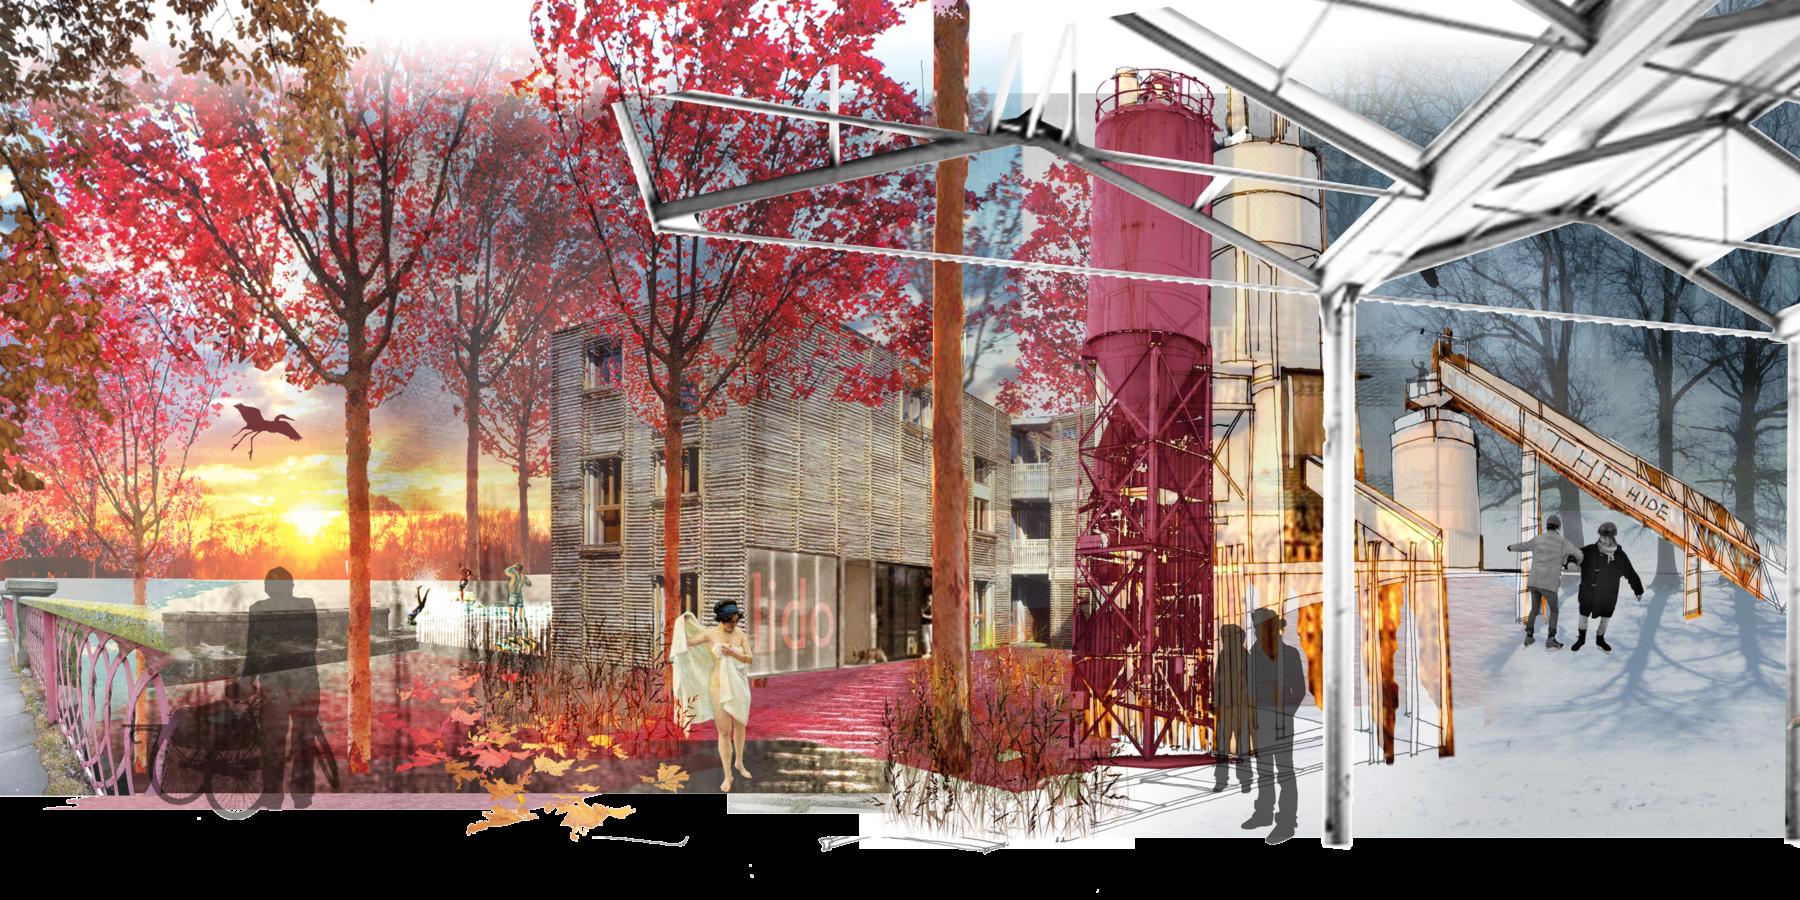 Sarah-Wigglesworth-Architects Soar Island 3600